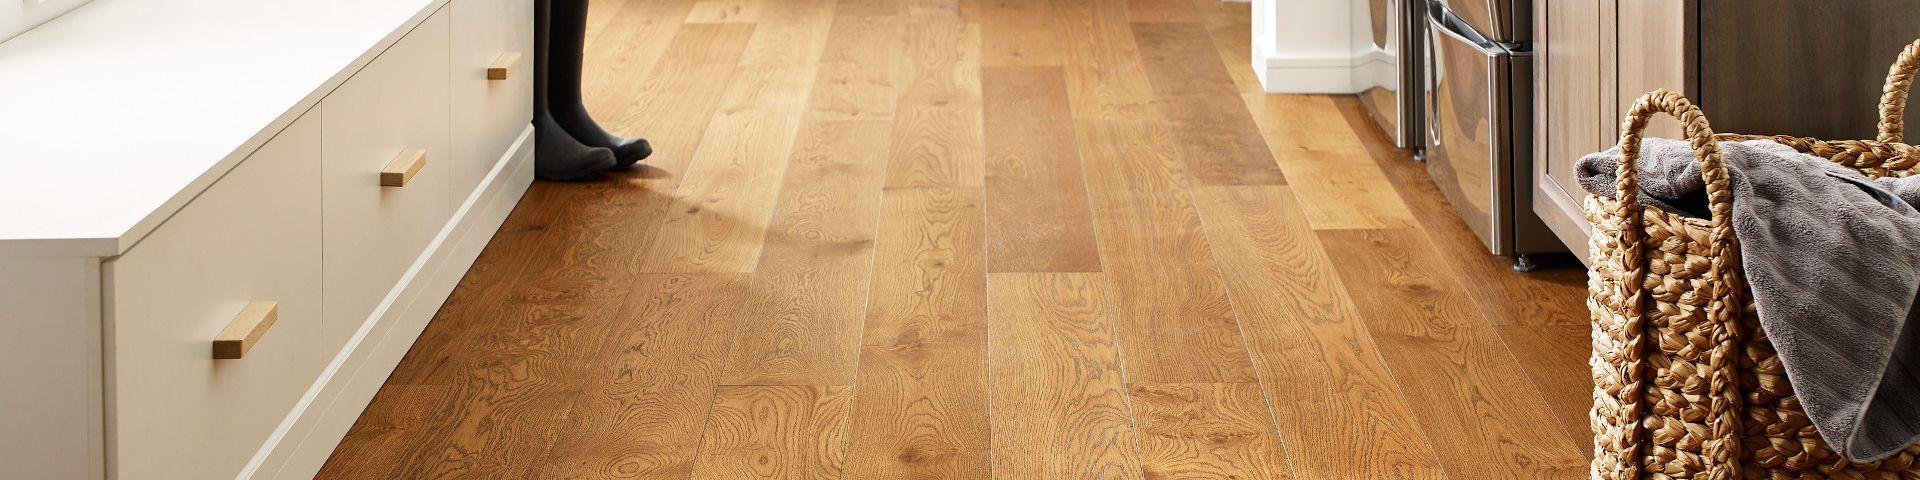 Resilient Vinyl, Floorte Pro Exquiste FH820